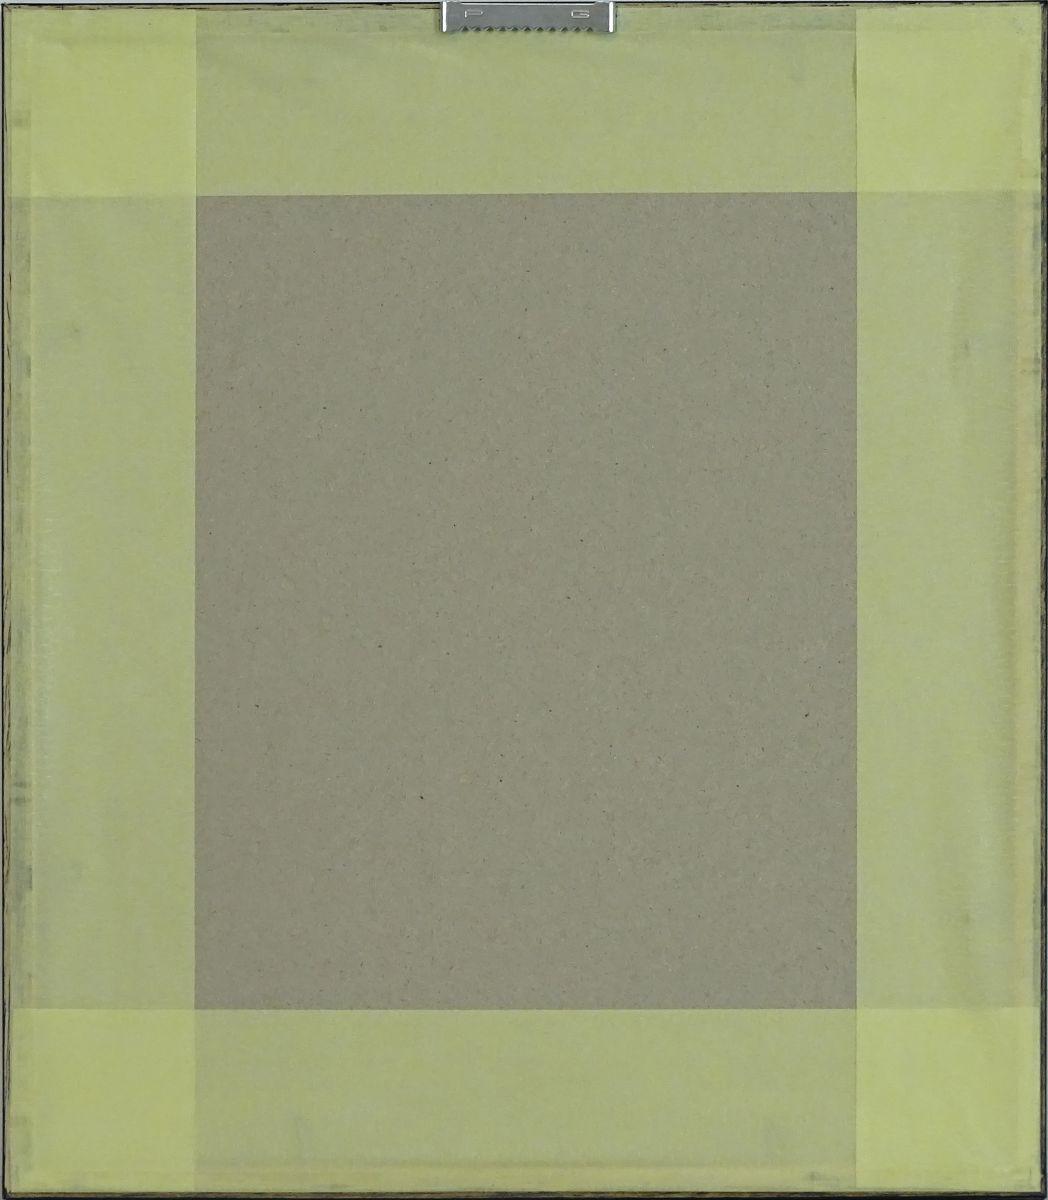 DSC06722.JPG (1048×1200)